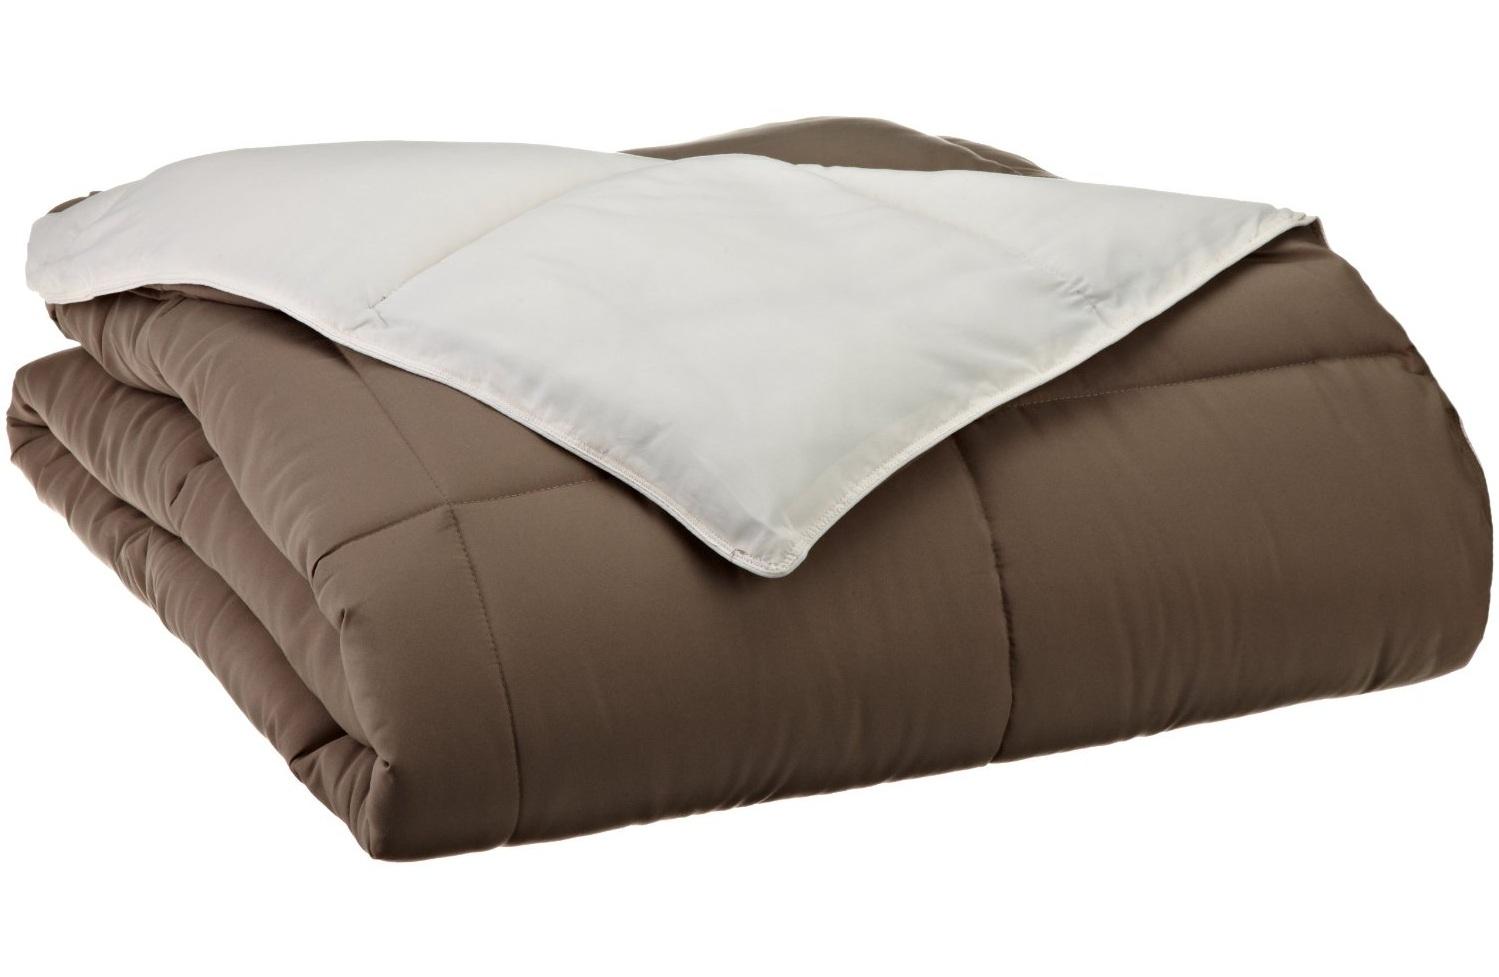 Reversible-All-season-Down-Alternative-Comforter-7-Fashionable-Colors thumbnail 9